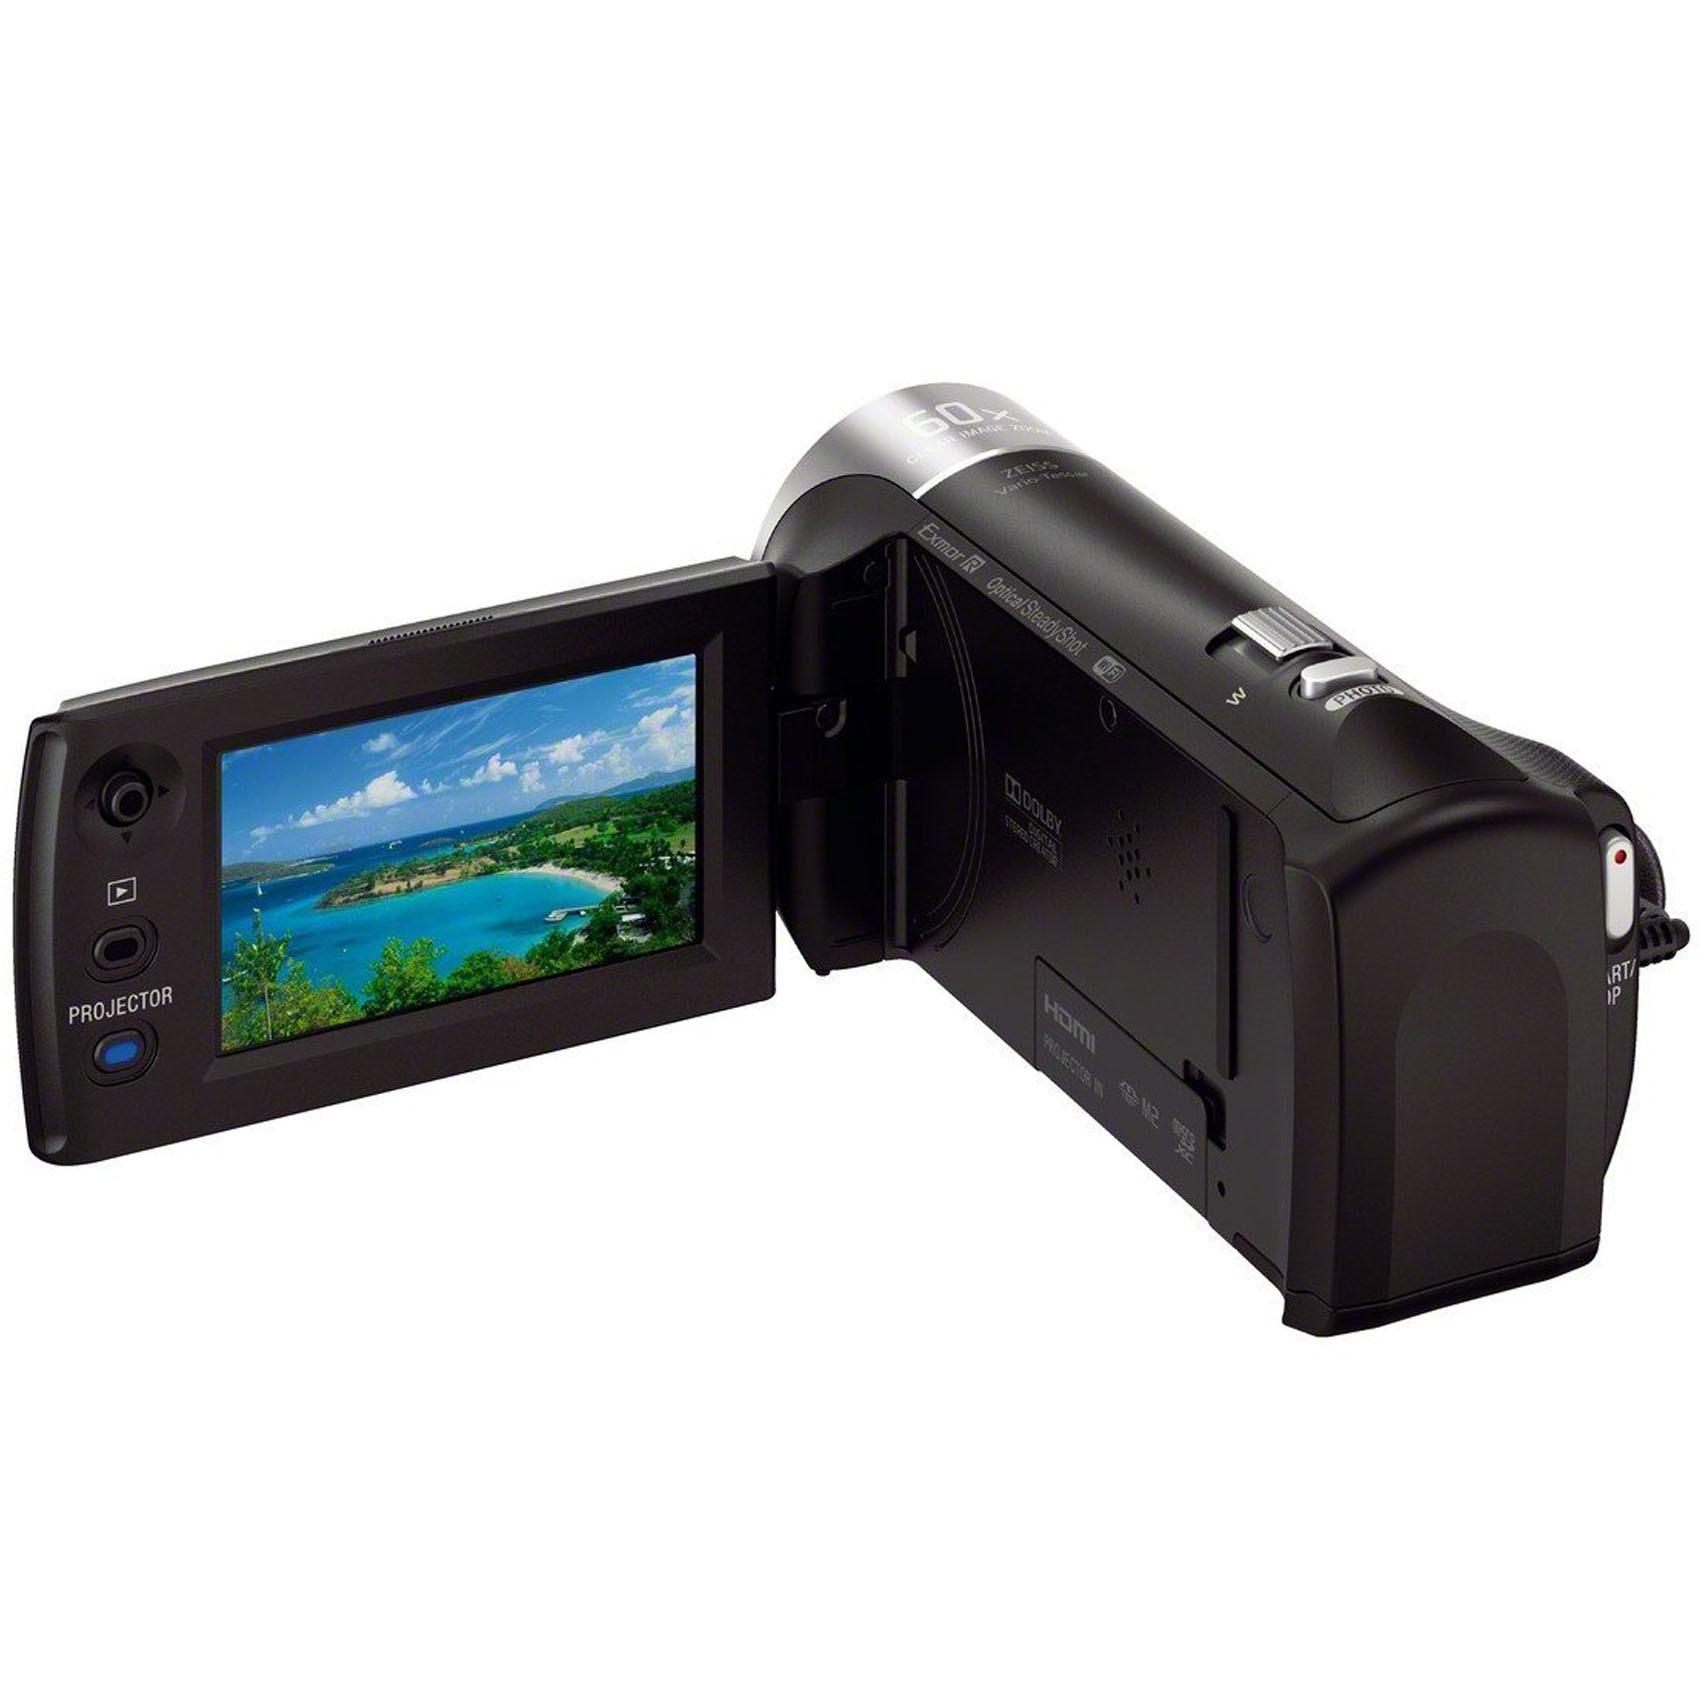 SONY CAM PROJ HDRPJ410+8GB+CASE